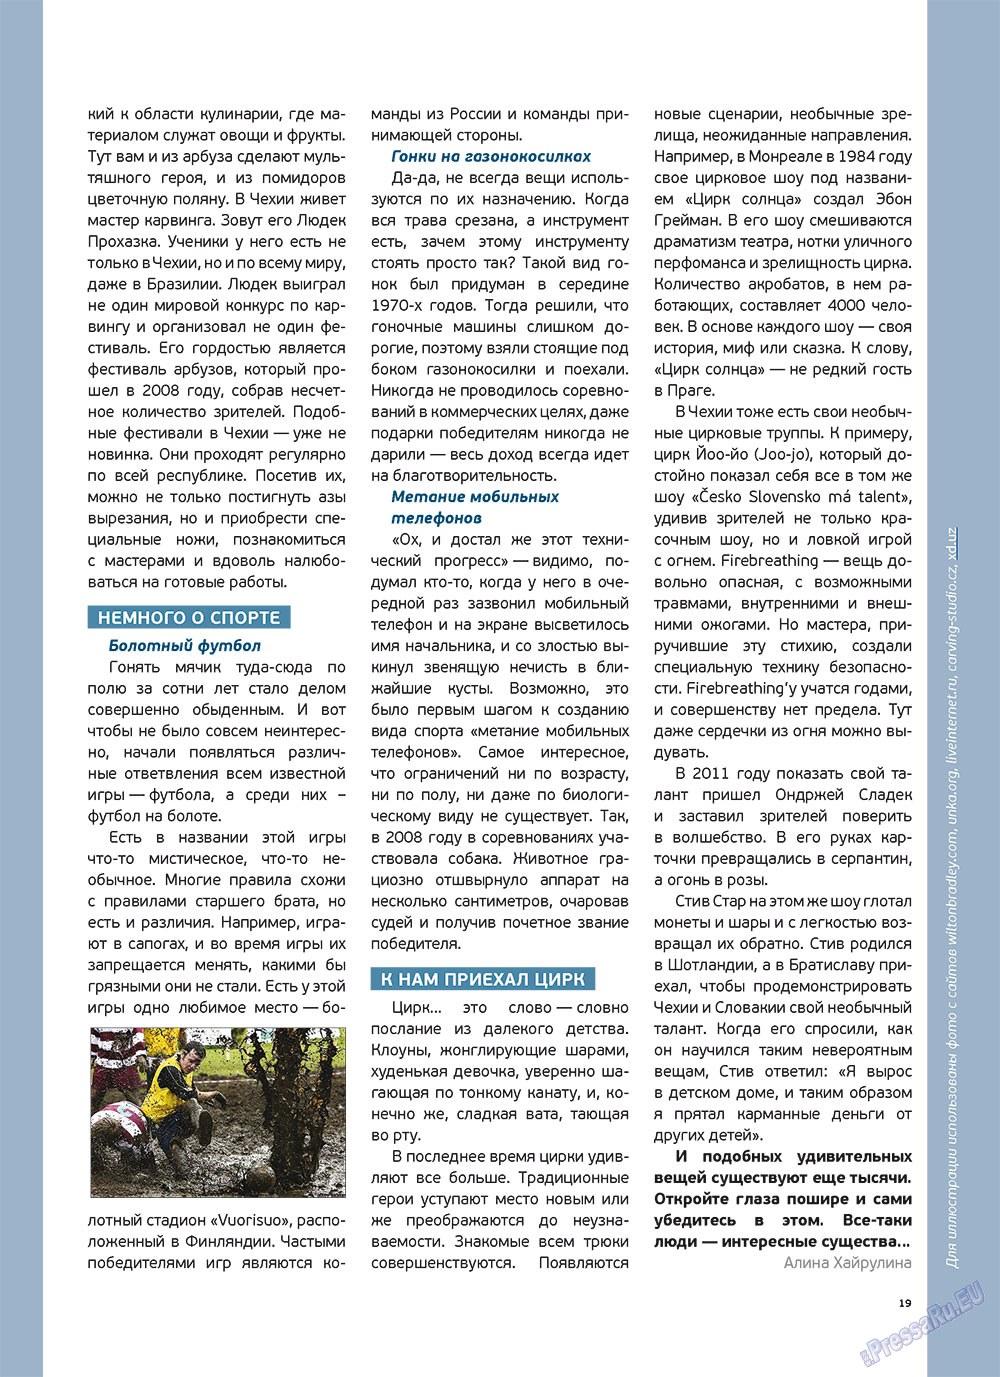 Артек (журнал). 2012 год, номер 3, стр. 21